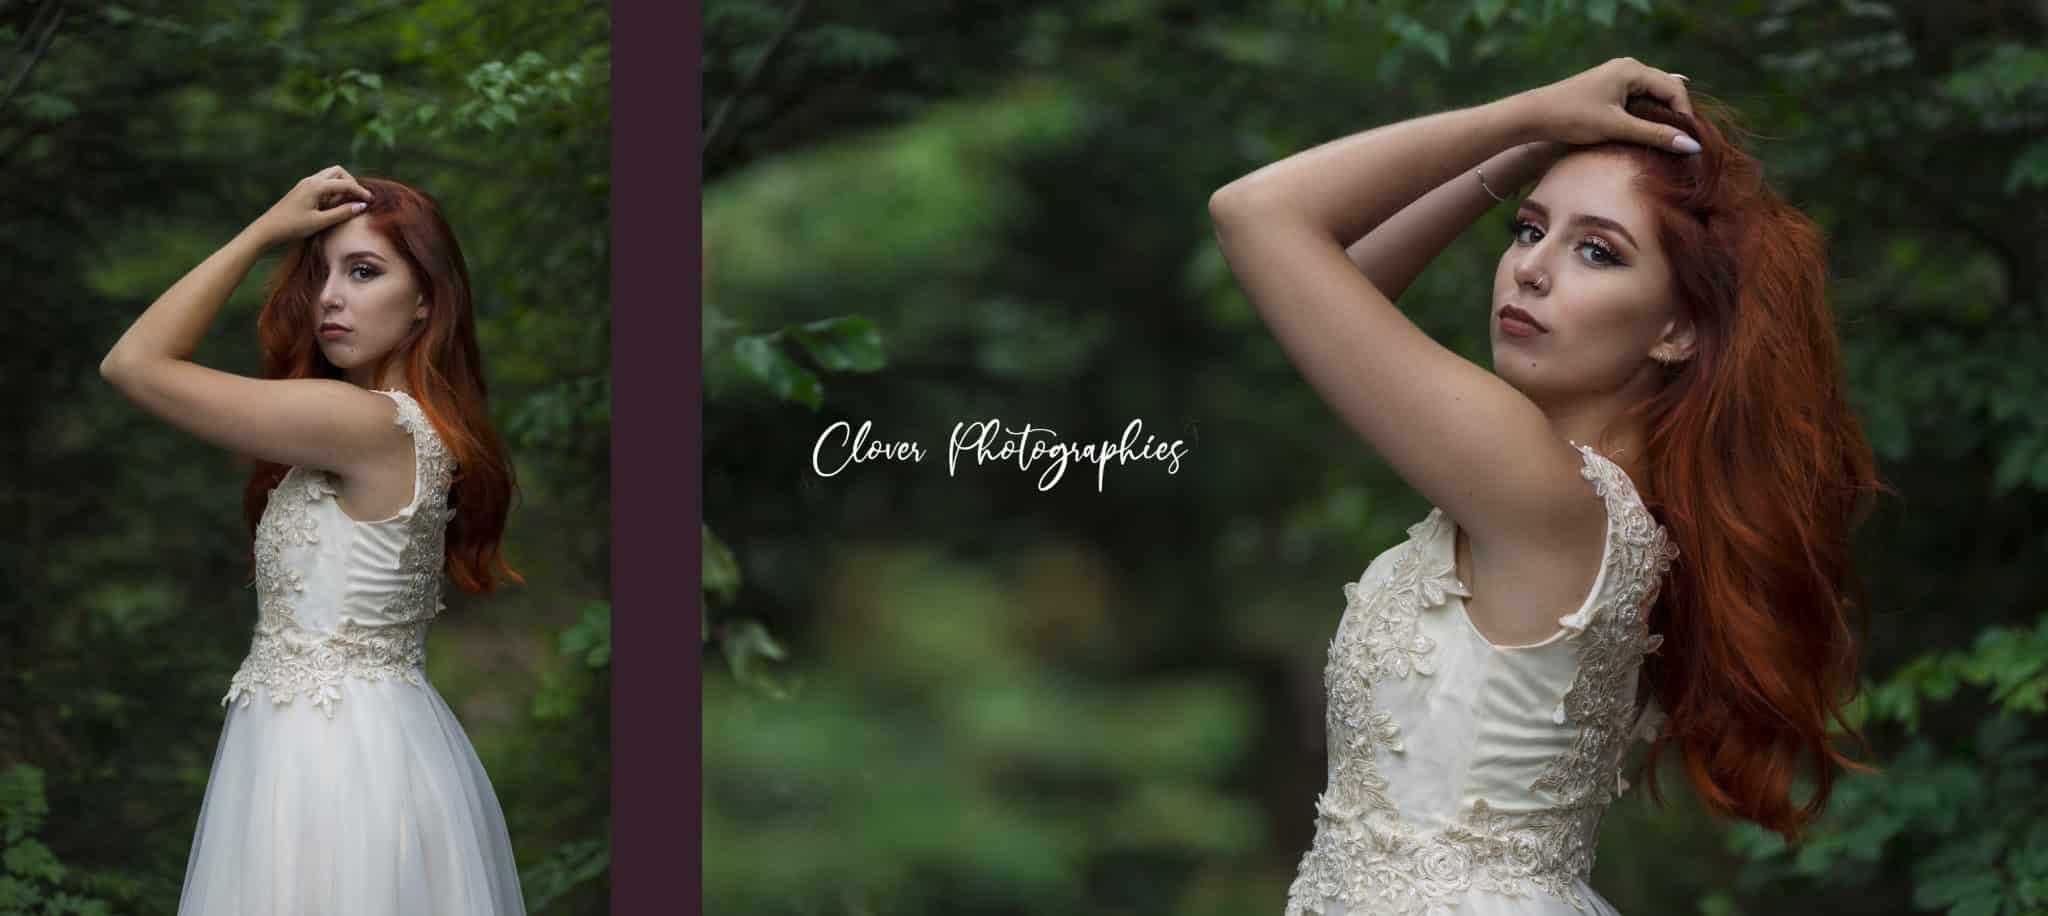 clover photographies - photographe mariage alsace